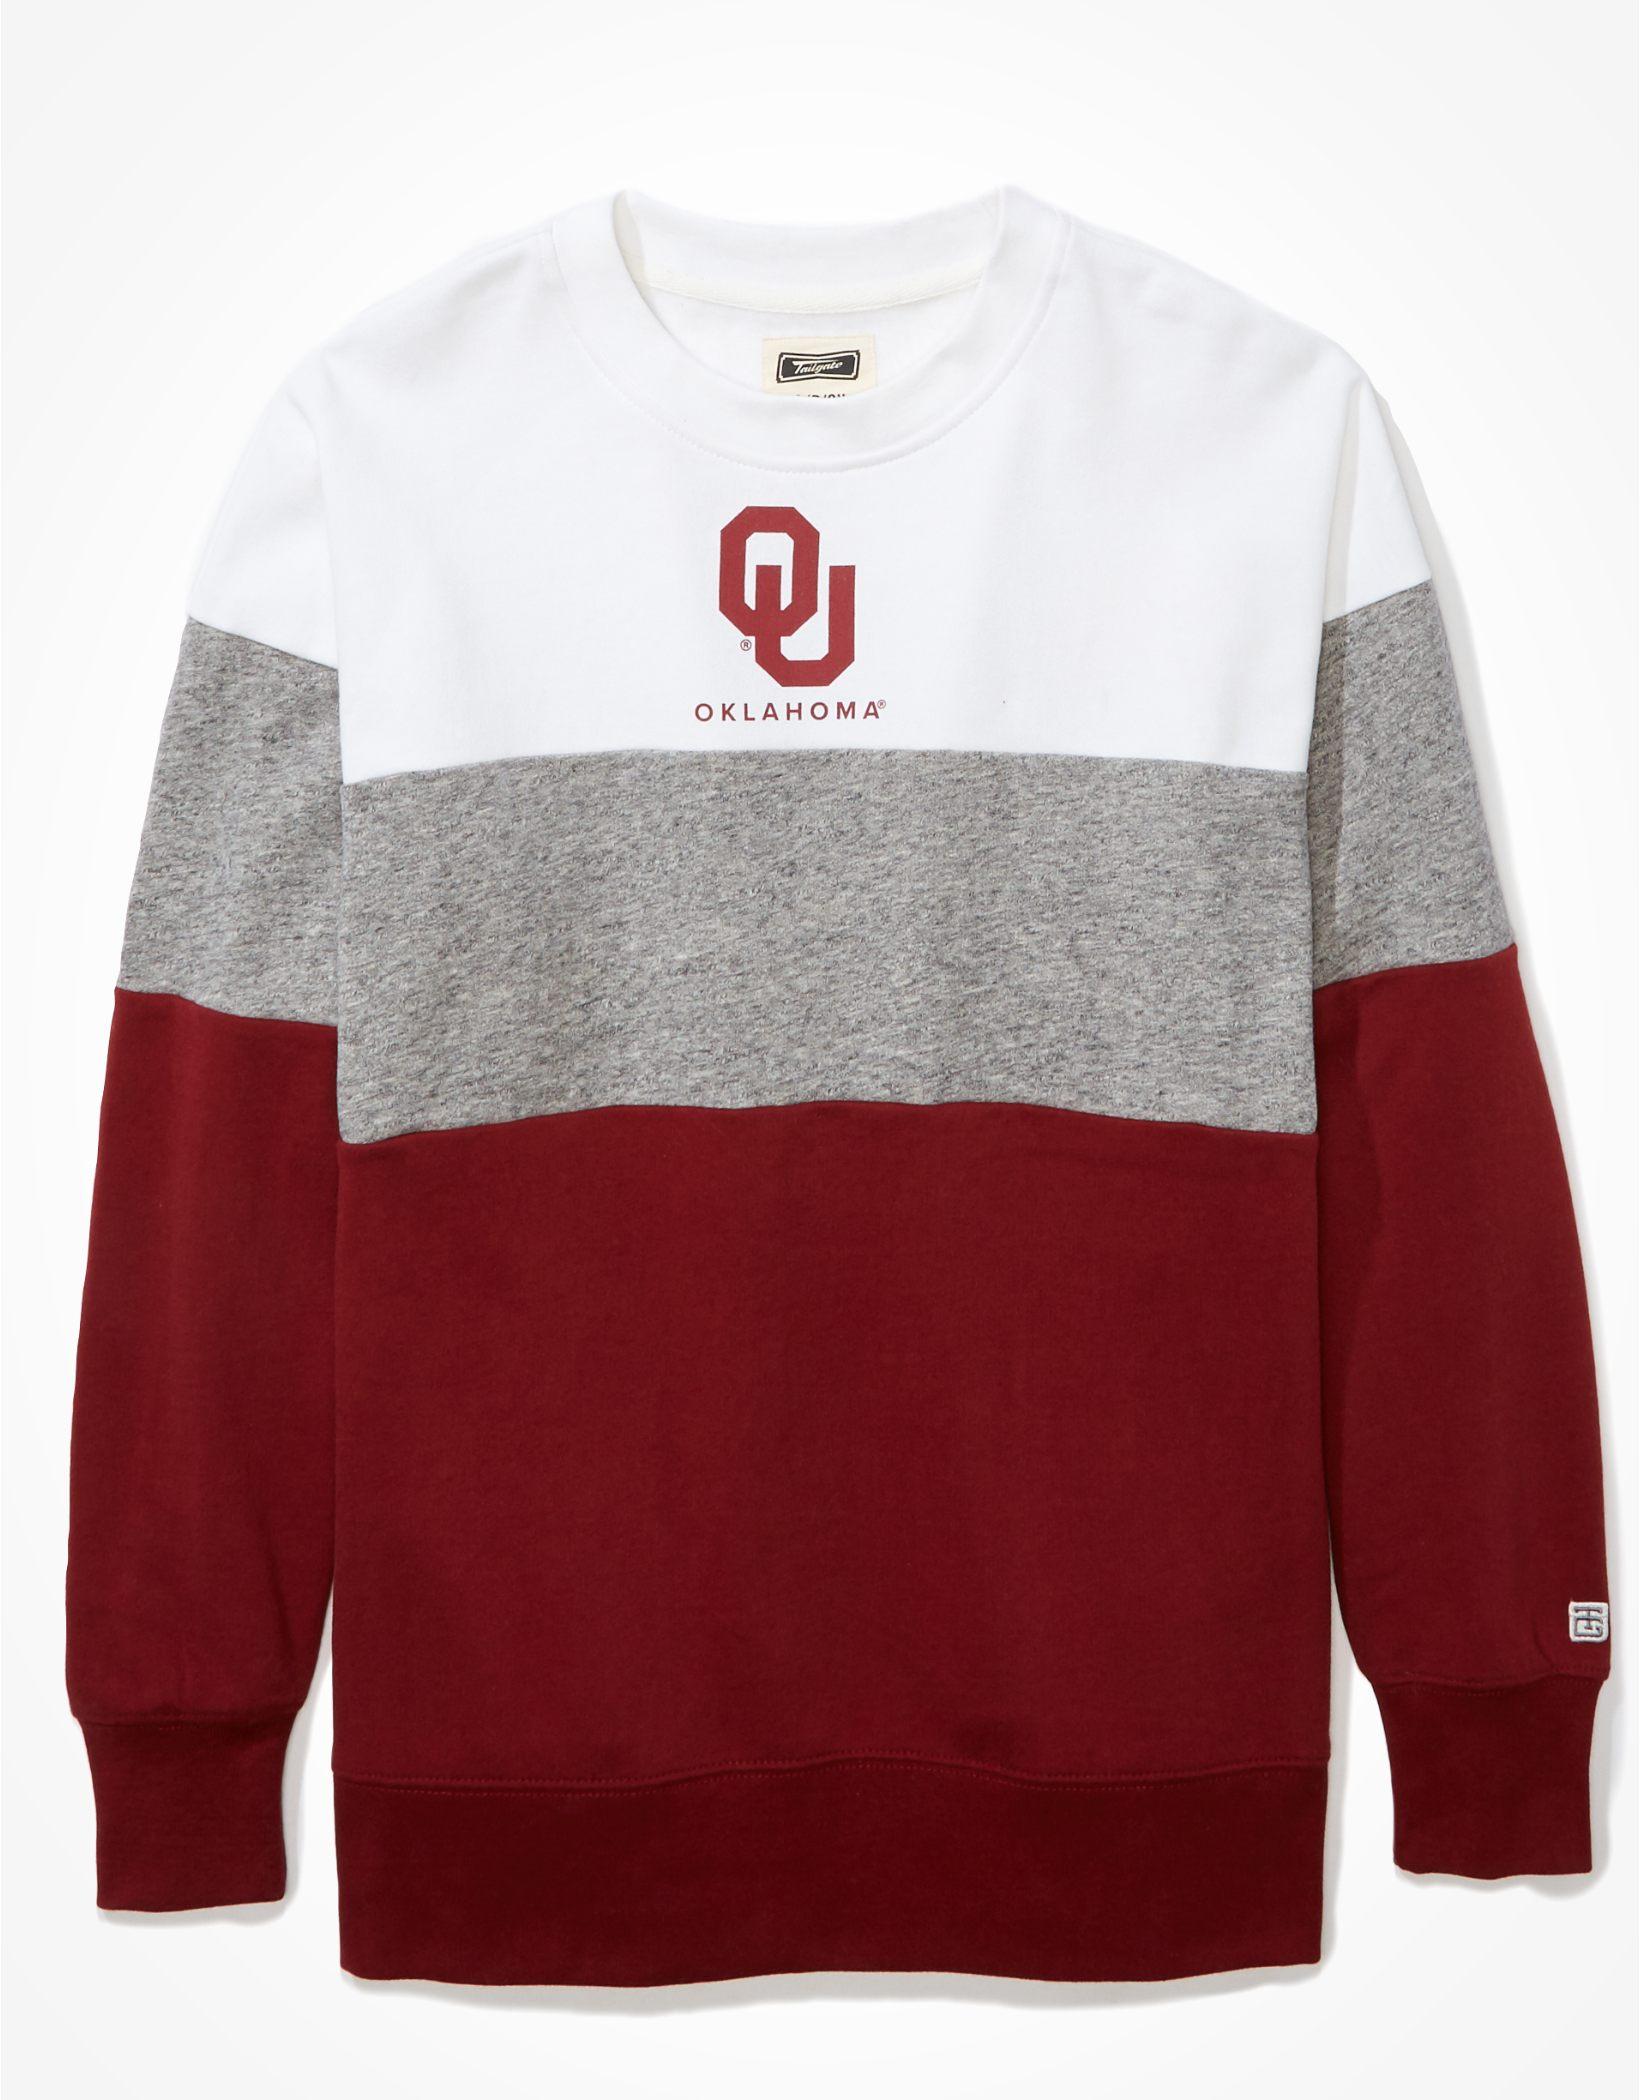 Tailgate Women's Oklahoma Sooners Colorblock Sweatshirt